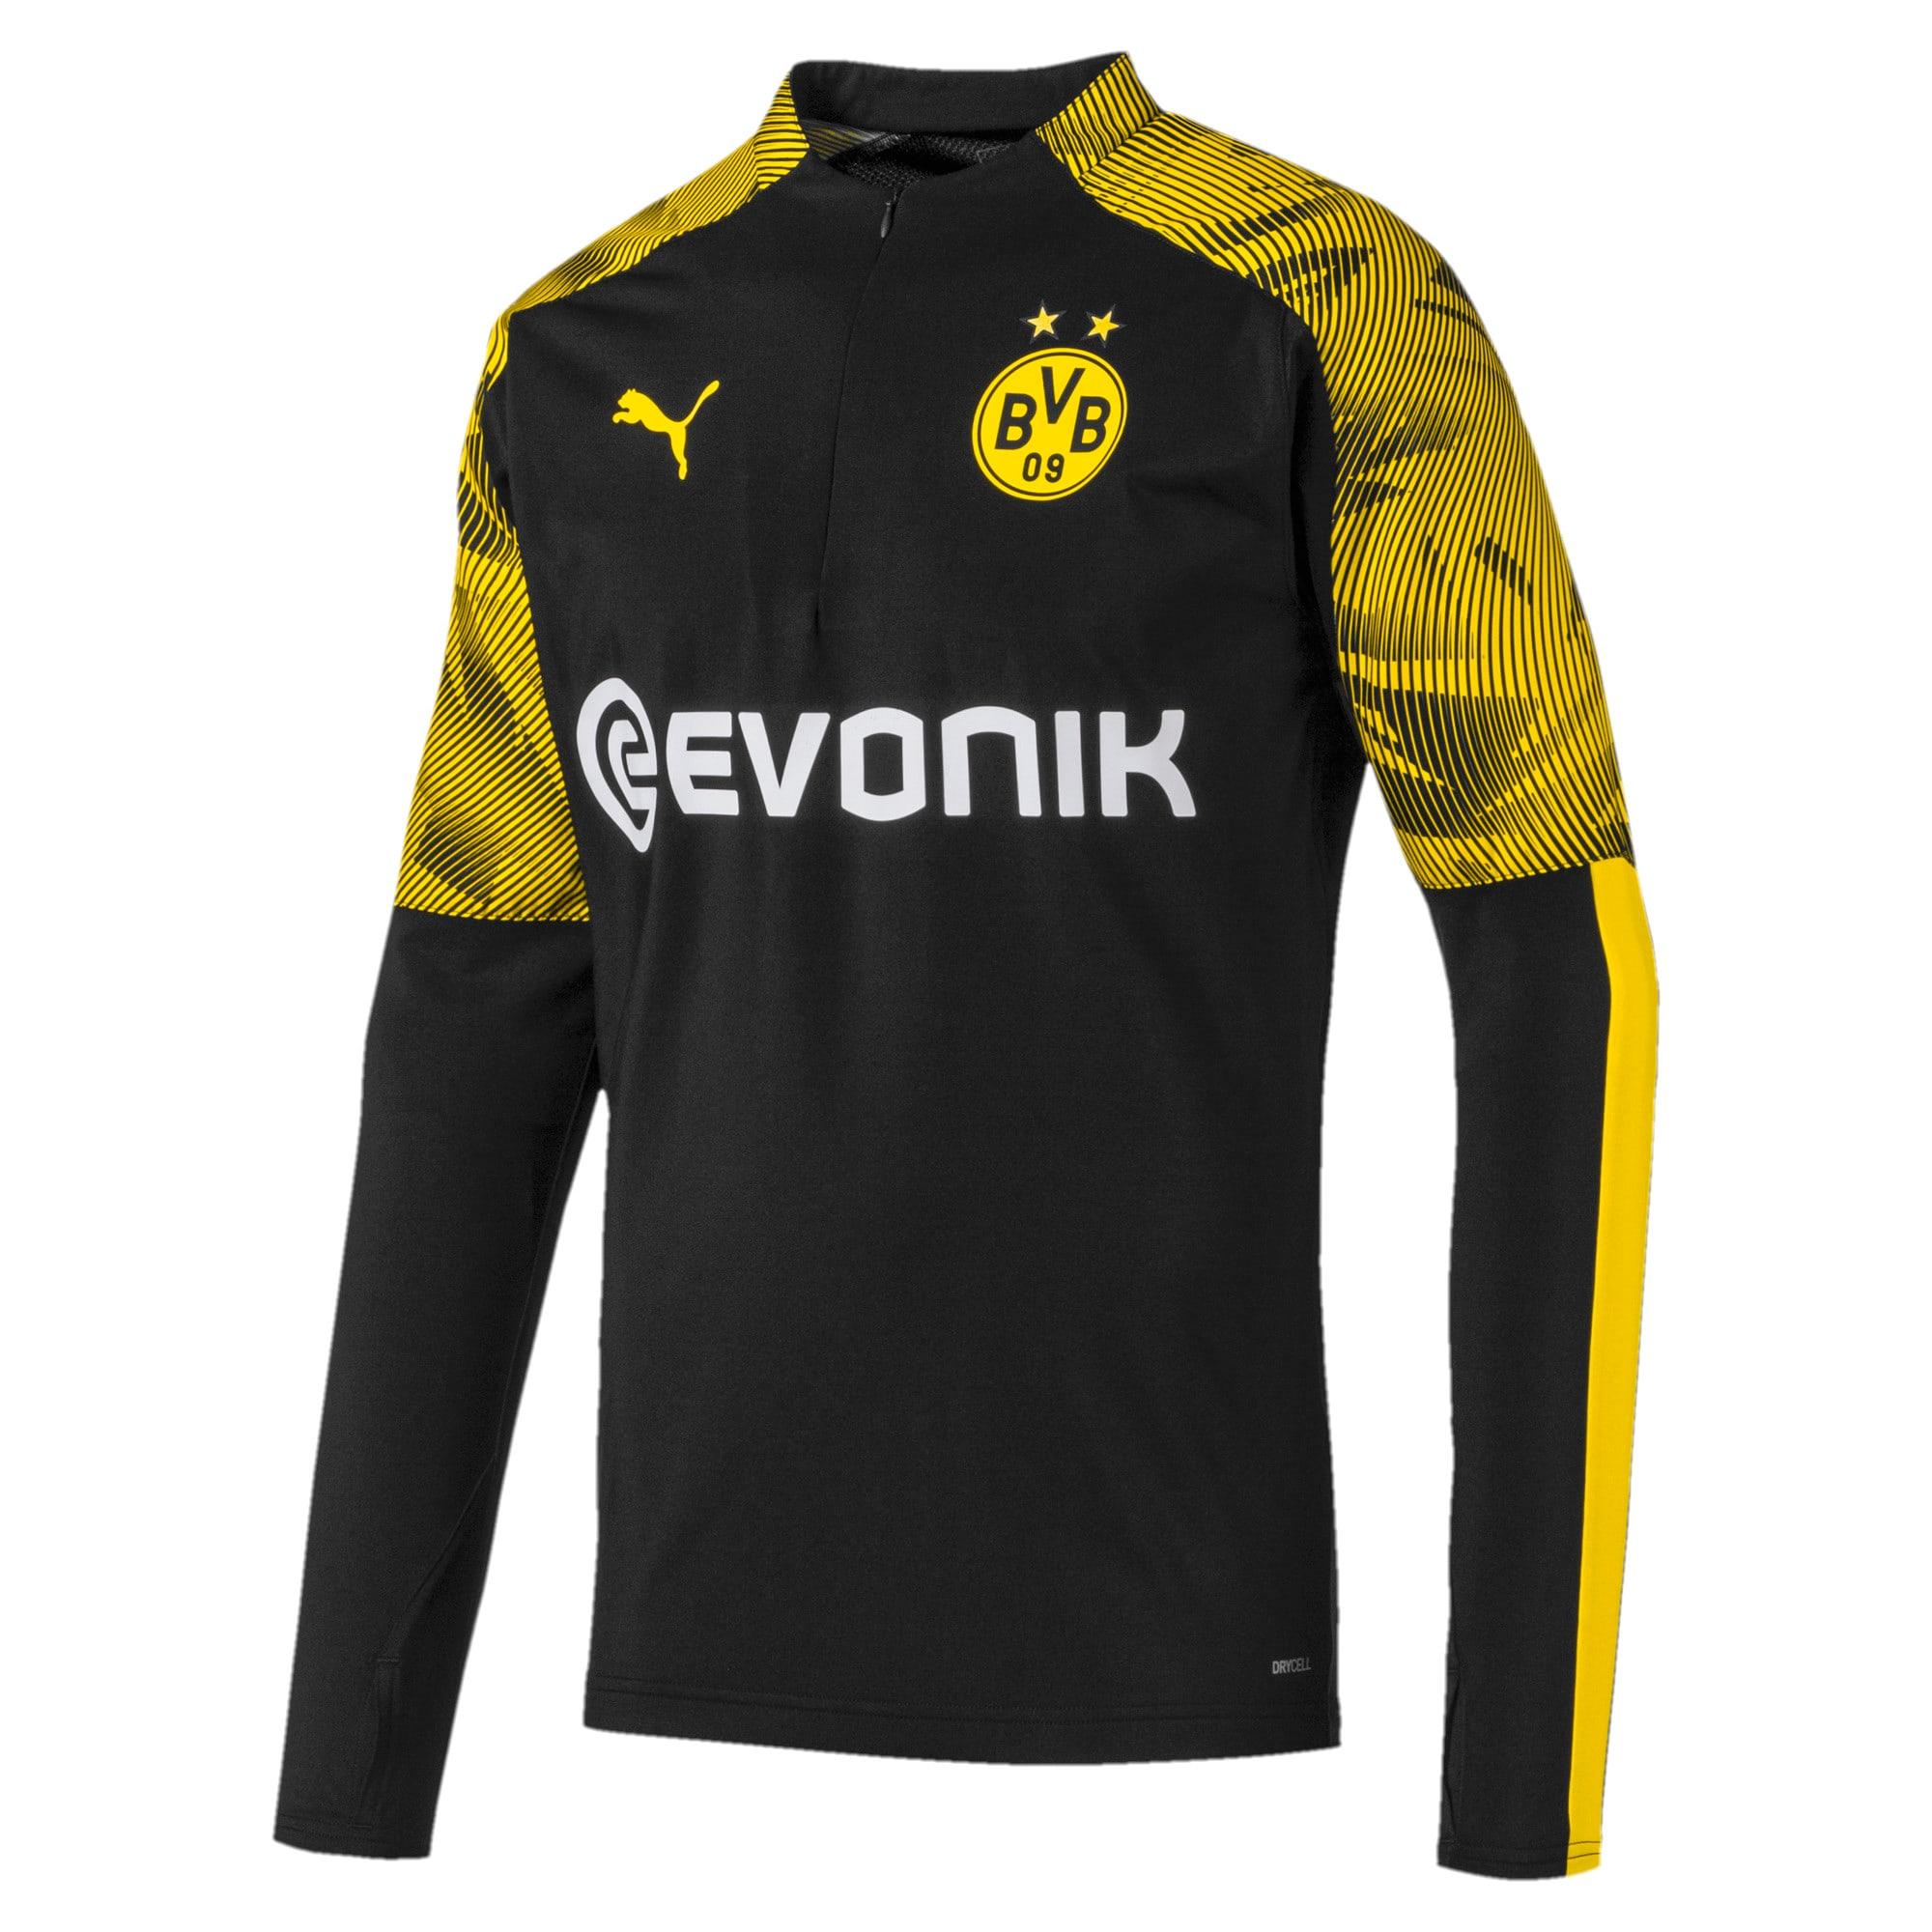 Thumbnail 4 of BVB Men's 1/4 Zip Training Top, Puma Black-Cyber Yellow, medium